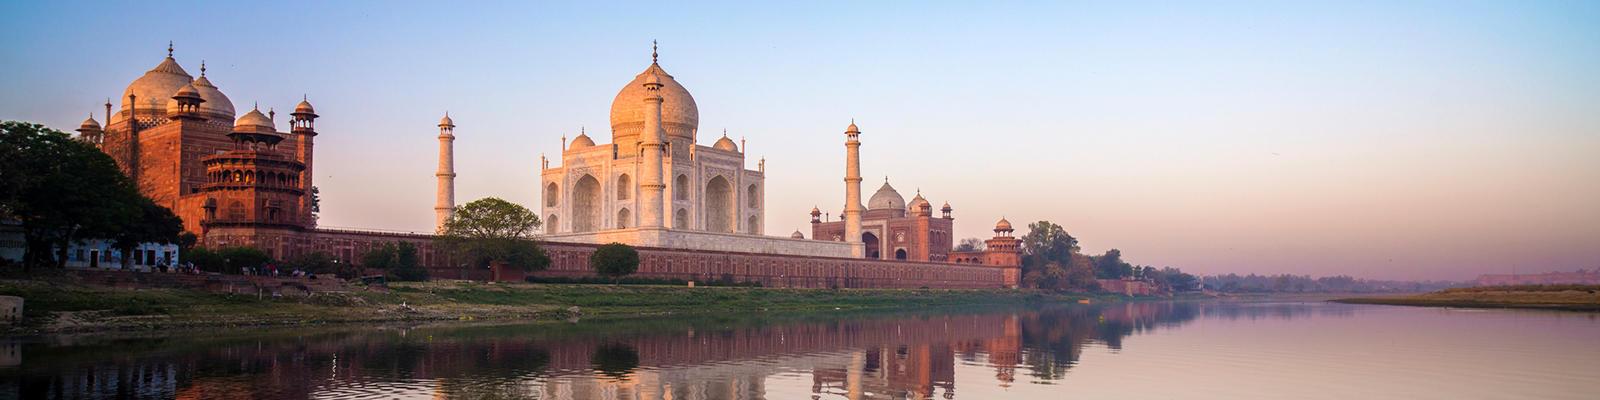 taj mahal at sunrise - 14 romantic travel experiences